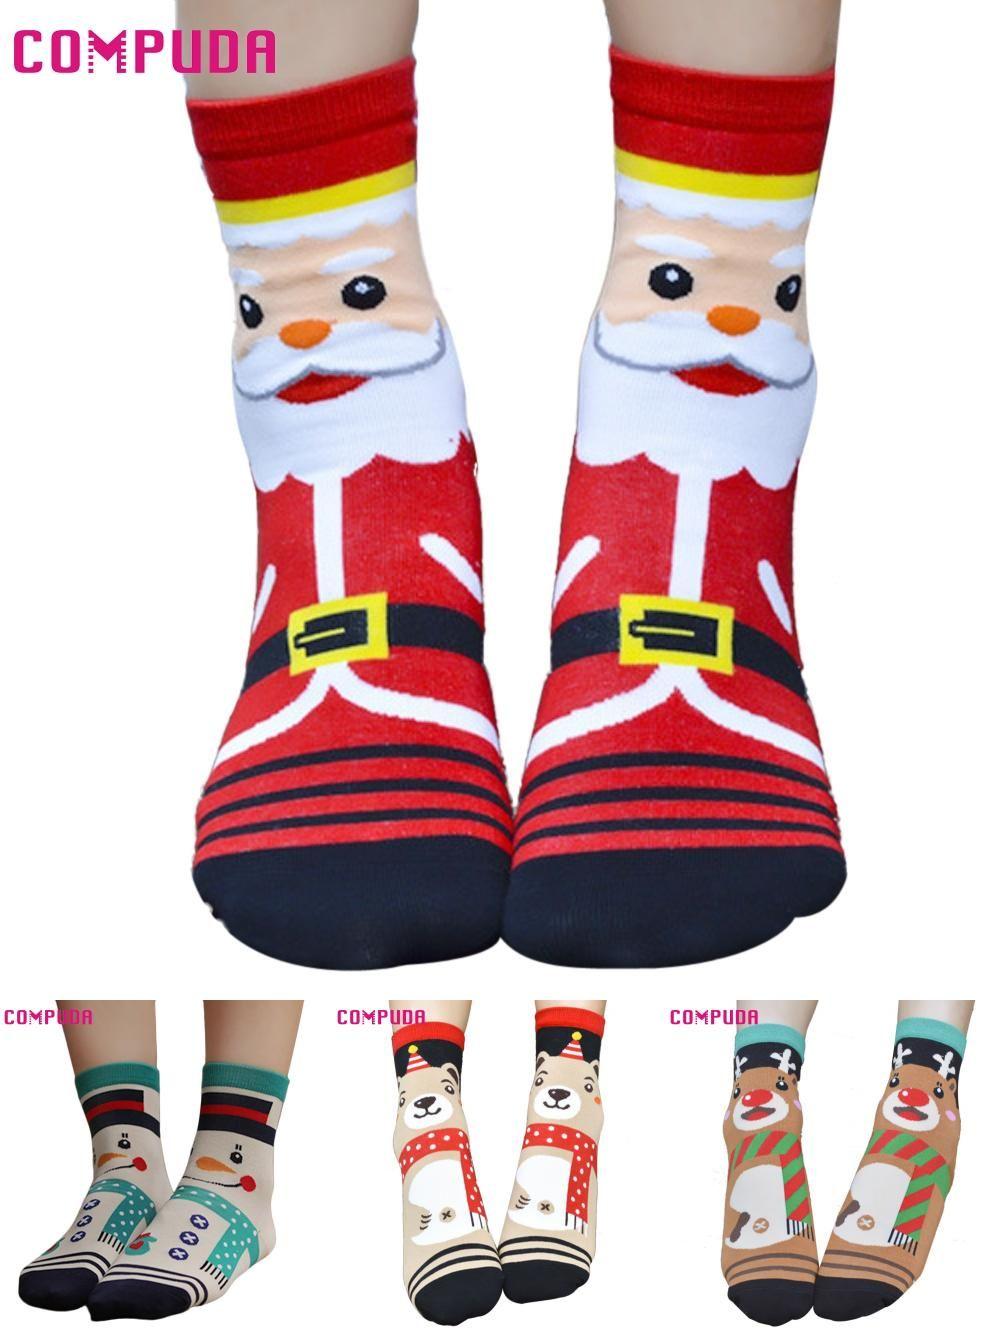 visit to buy compuda 3d cartoon christmas socks women cotton socks floor u6822 drop - Christmas Socks For Men